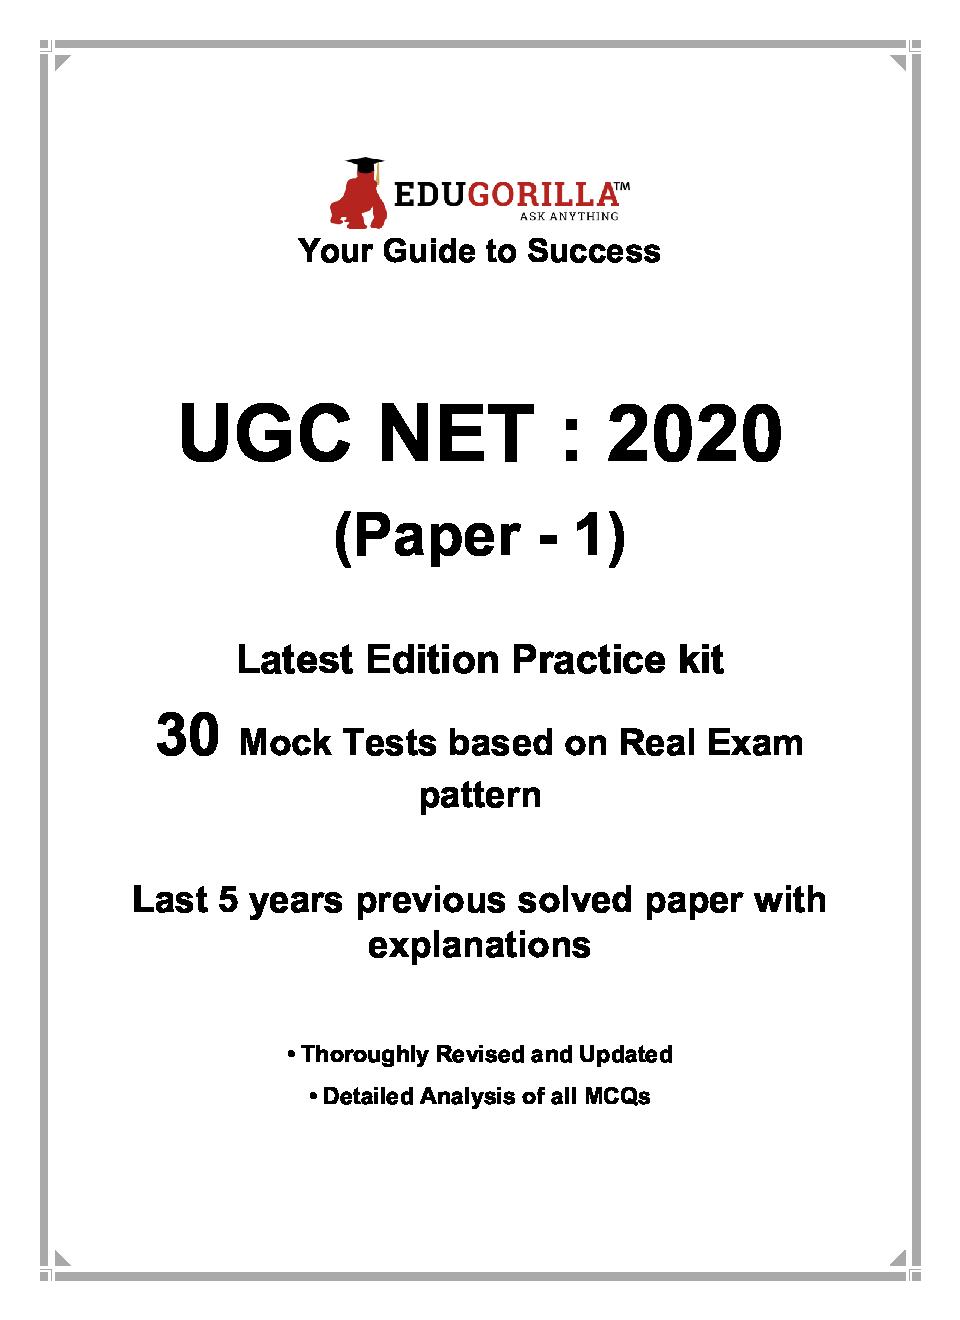 EduGorilla UGC NET : 2020 (Paper - 1) Latest Edition Practice Kit - Page 3